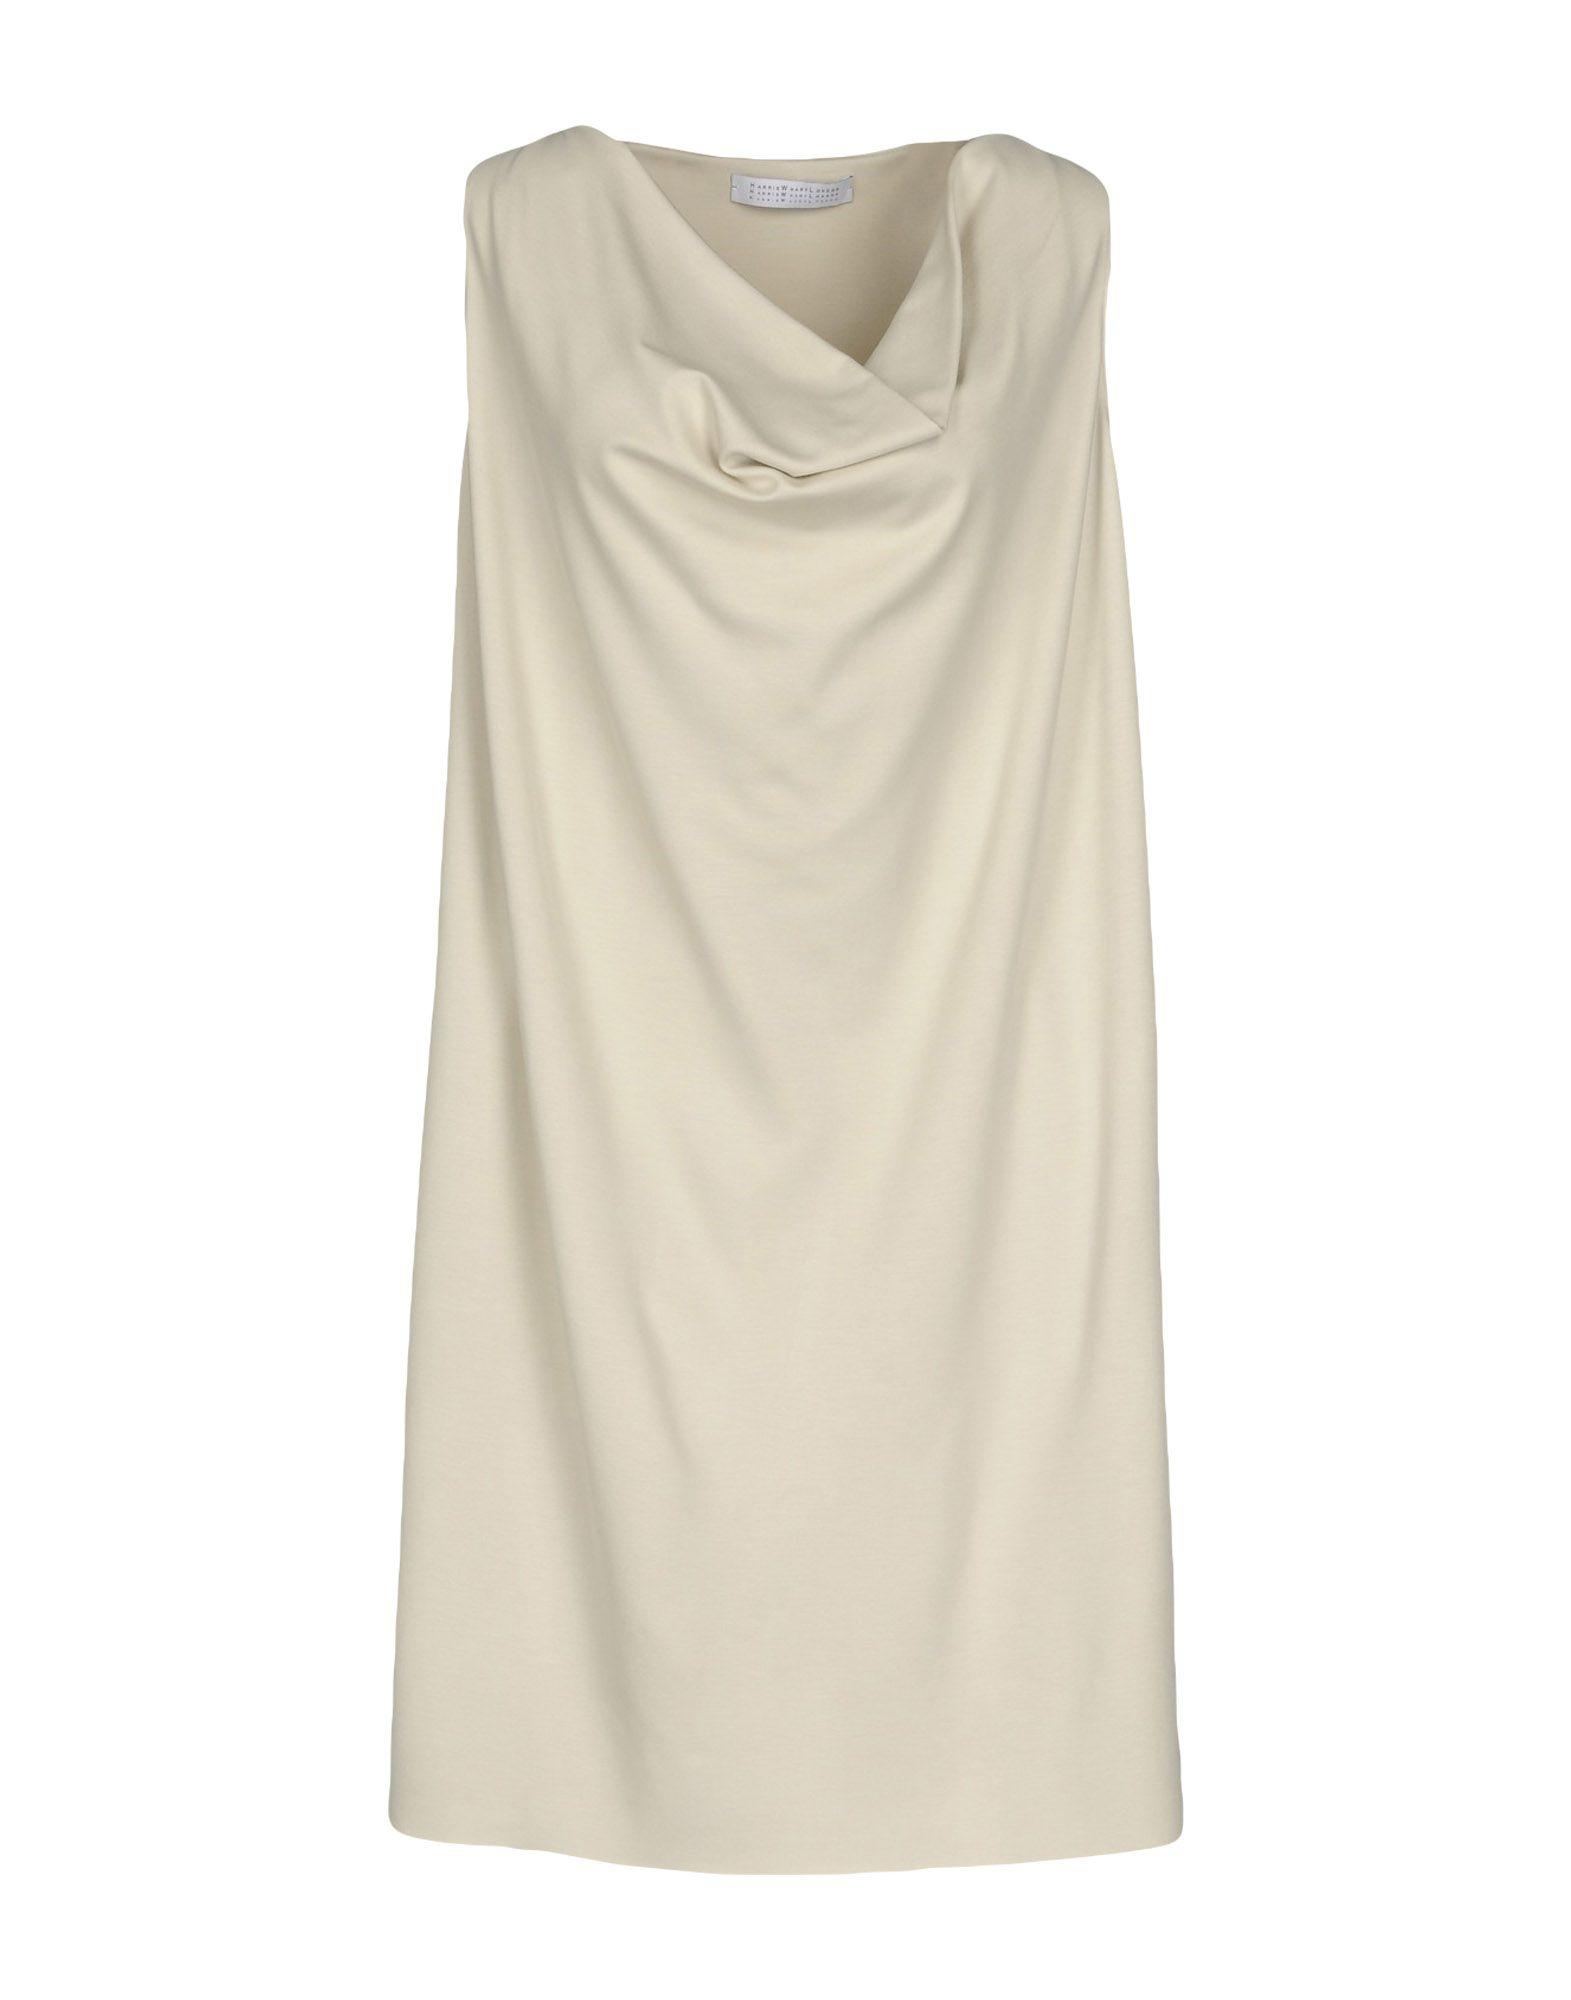 HARRIS WHARF LONDON Короткое платье броши модные истории брошь